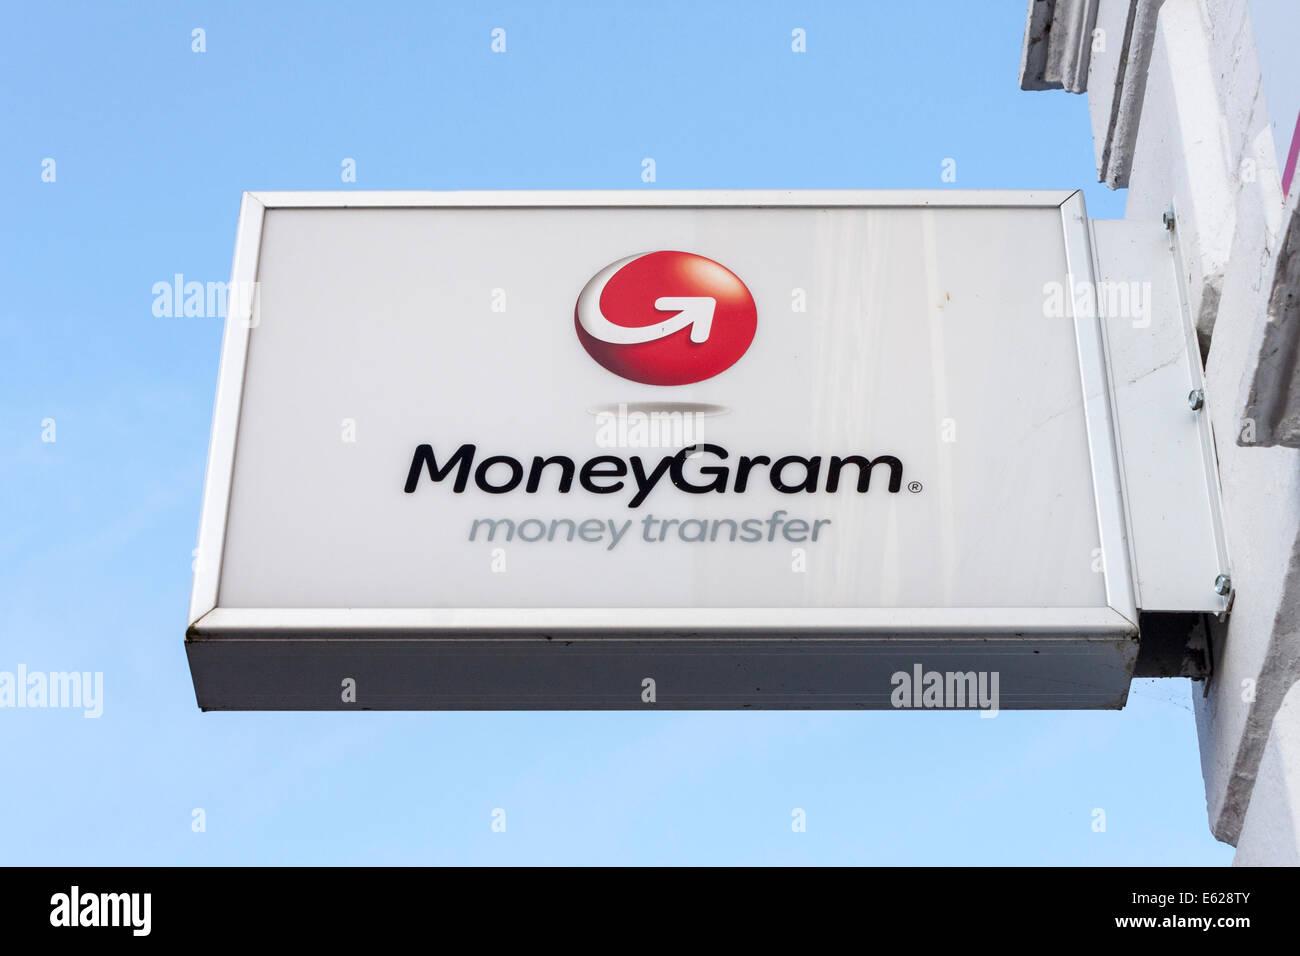 Money Gram Stock Photos Amp Money Gram Stock Images Alamy